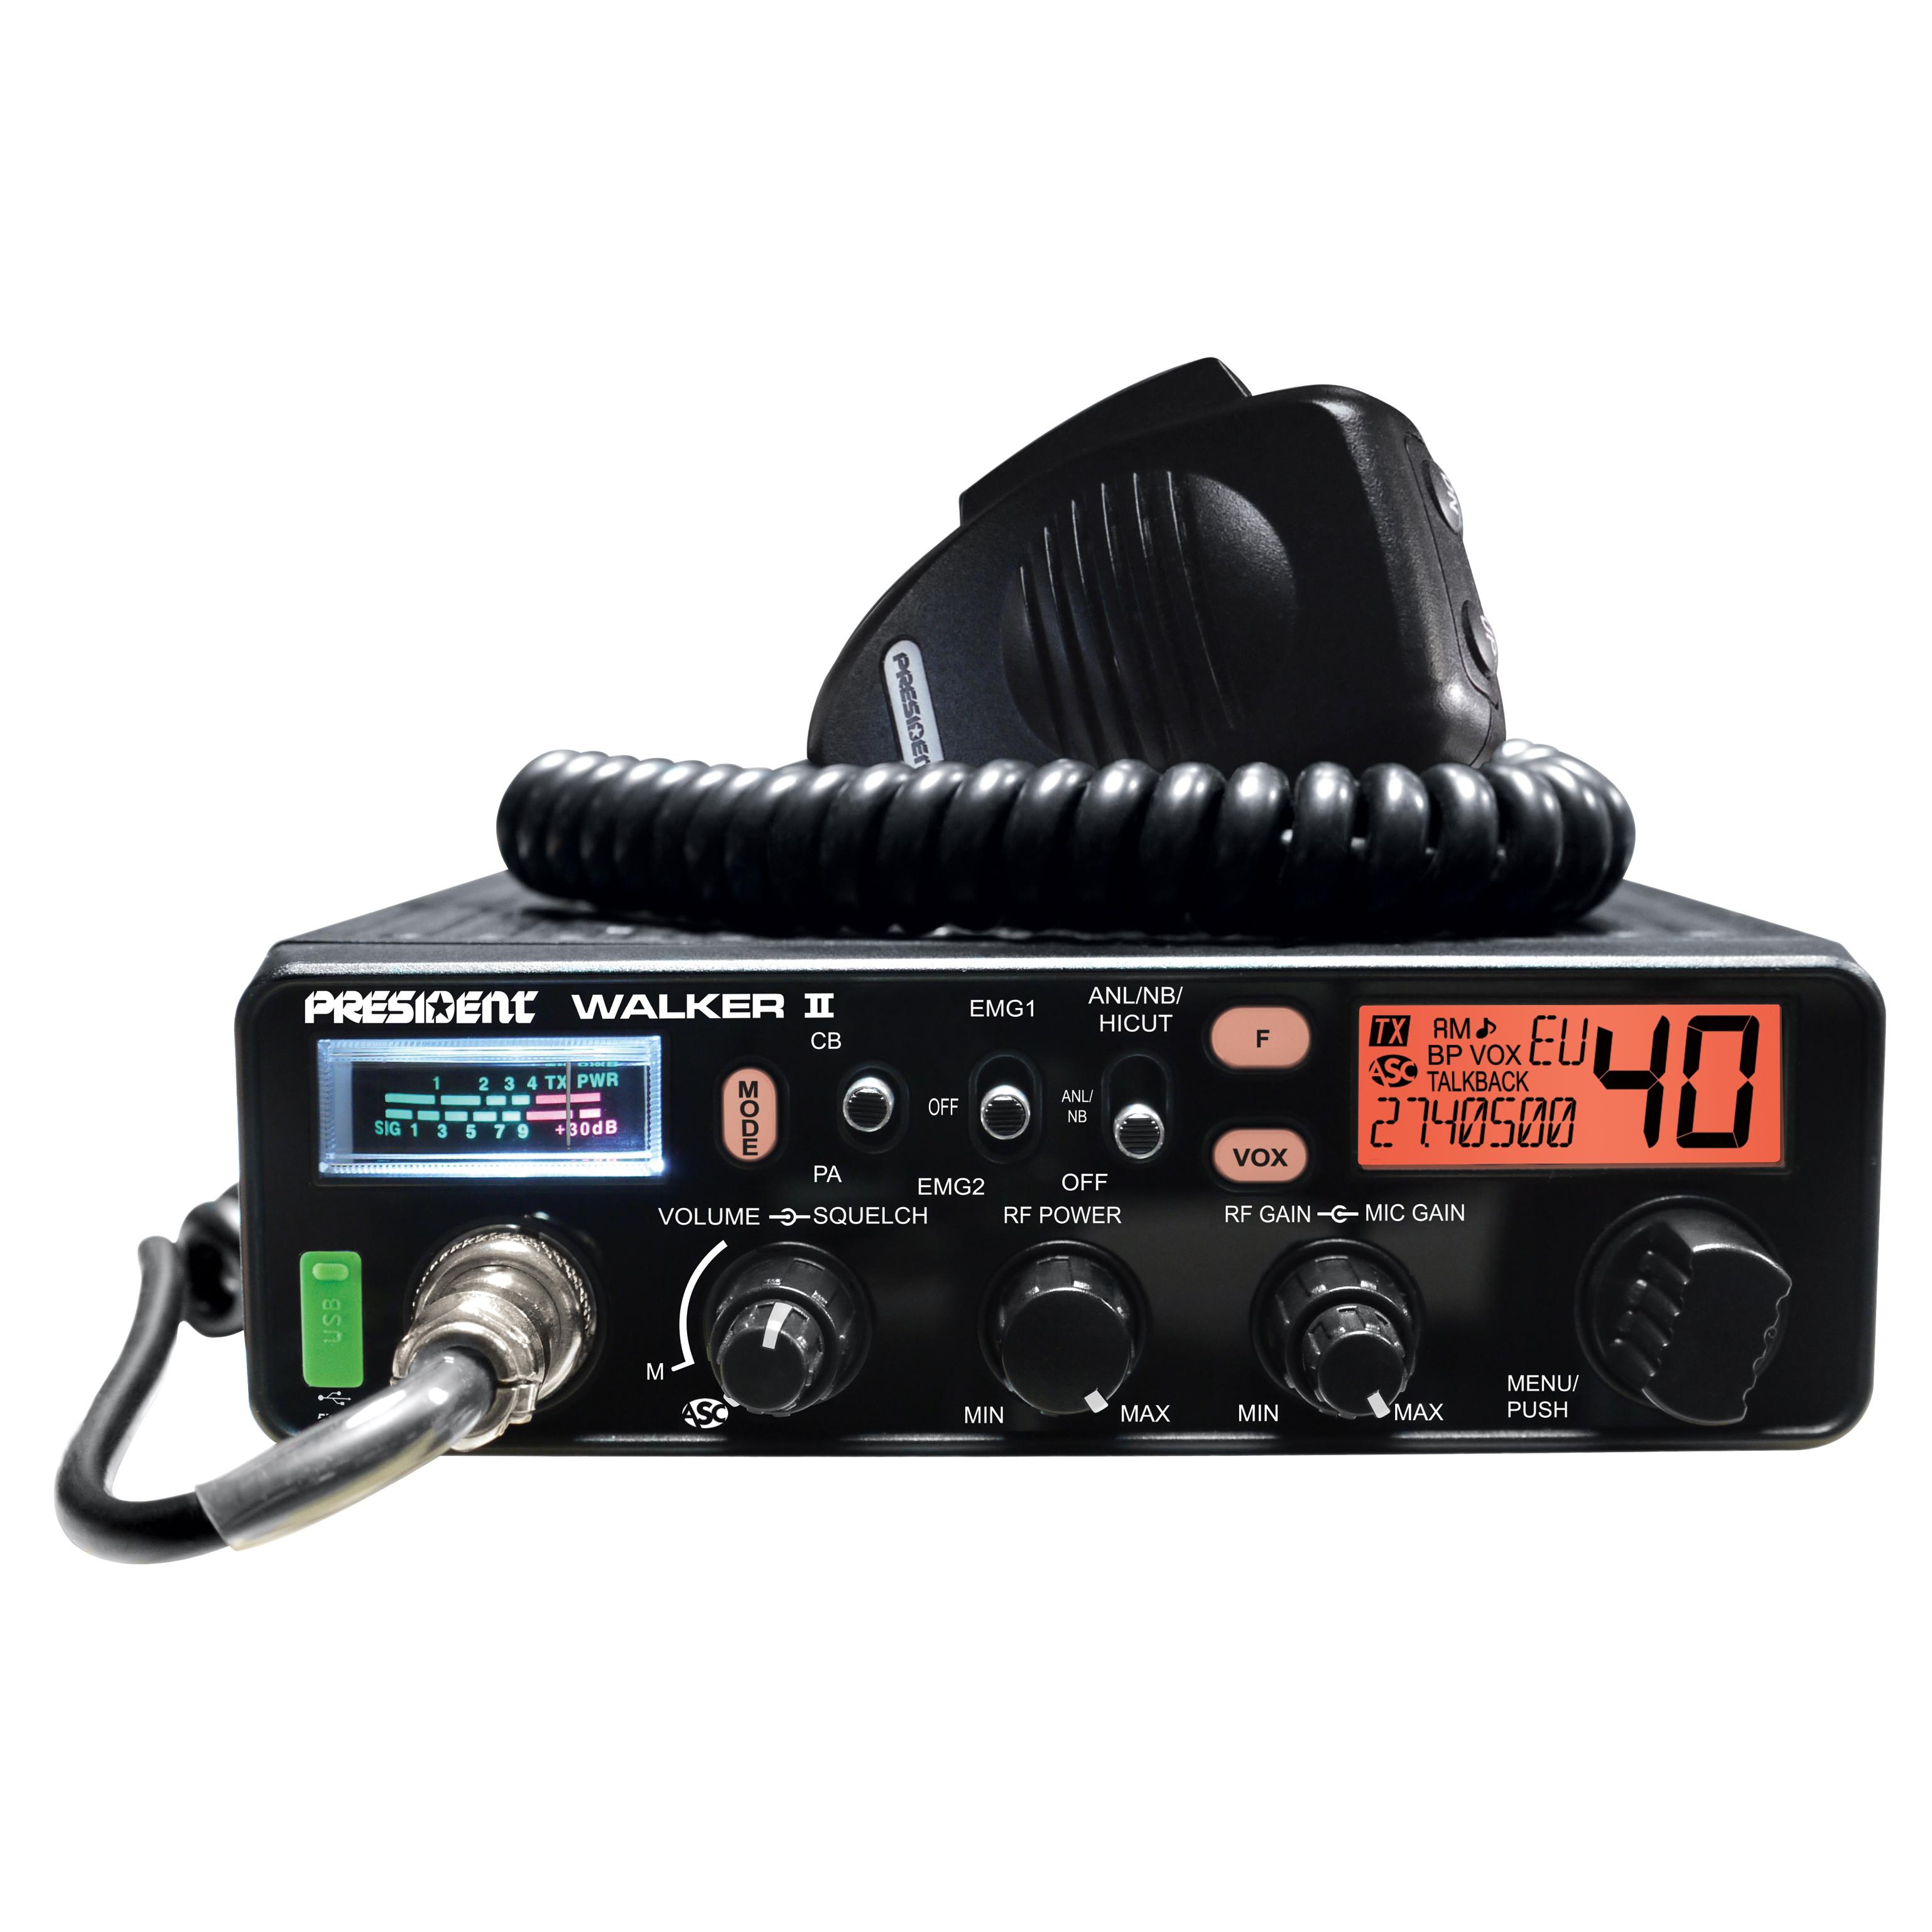 WALKER II ASC Classic - Equipos AM/FM - Radio CB / RAdioAficion - President  Electronics